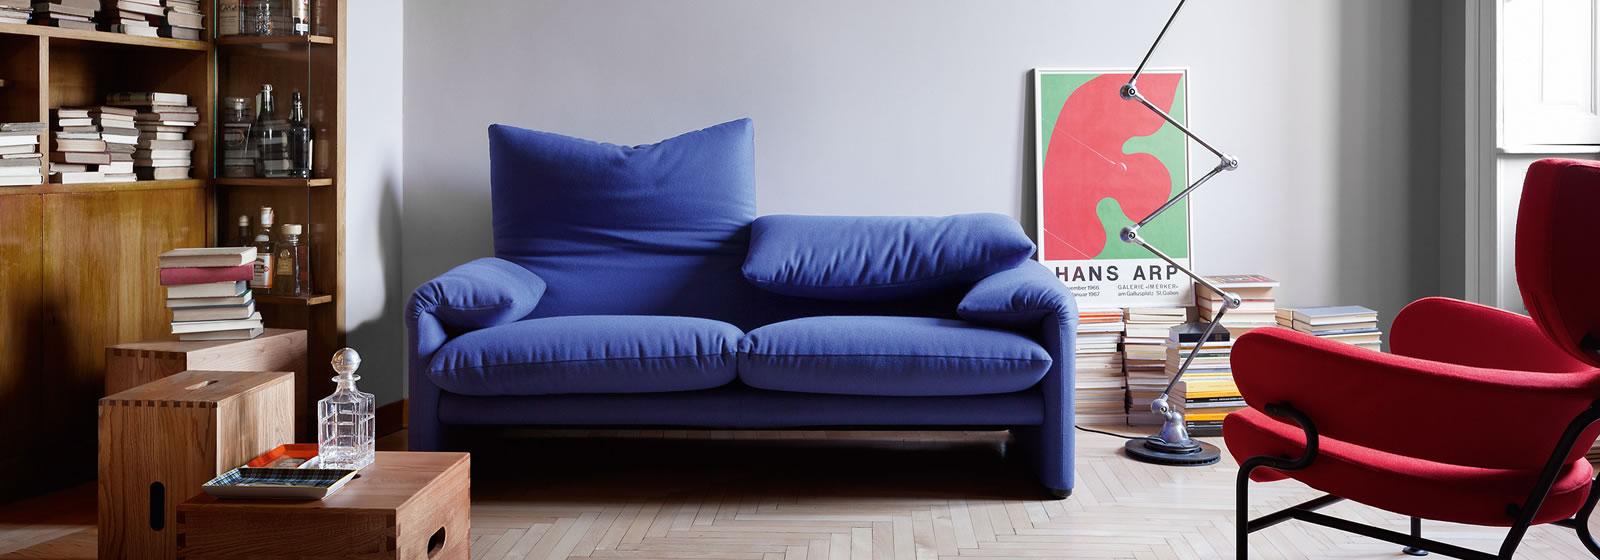 Maralunga Cassina  divano maralunga cassina